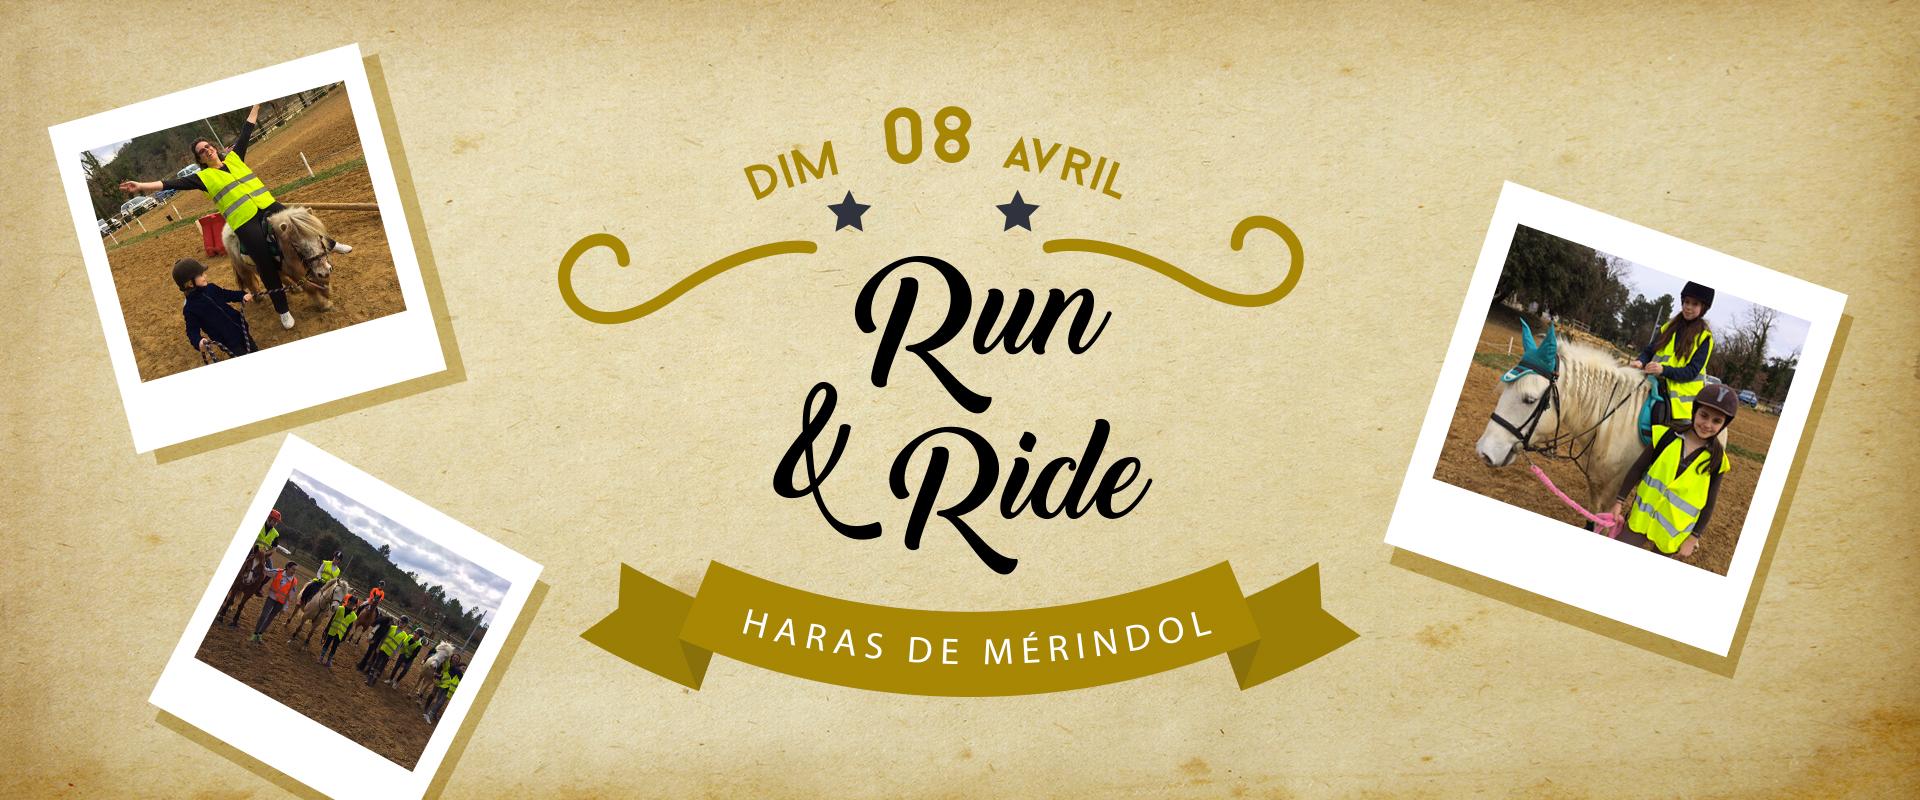 Haras-Merindol_RunRide